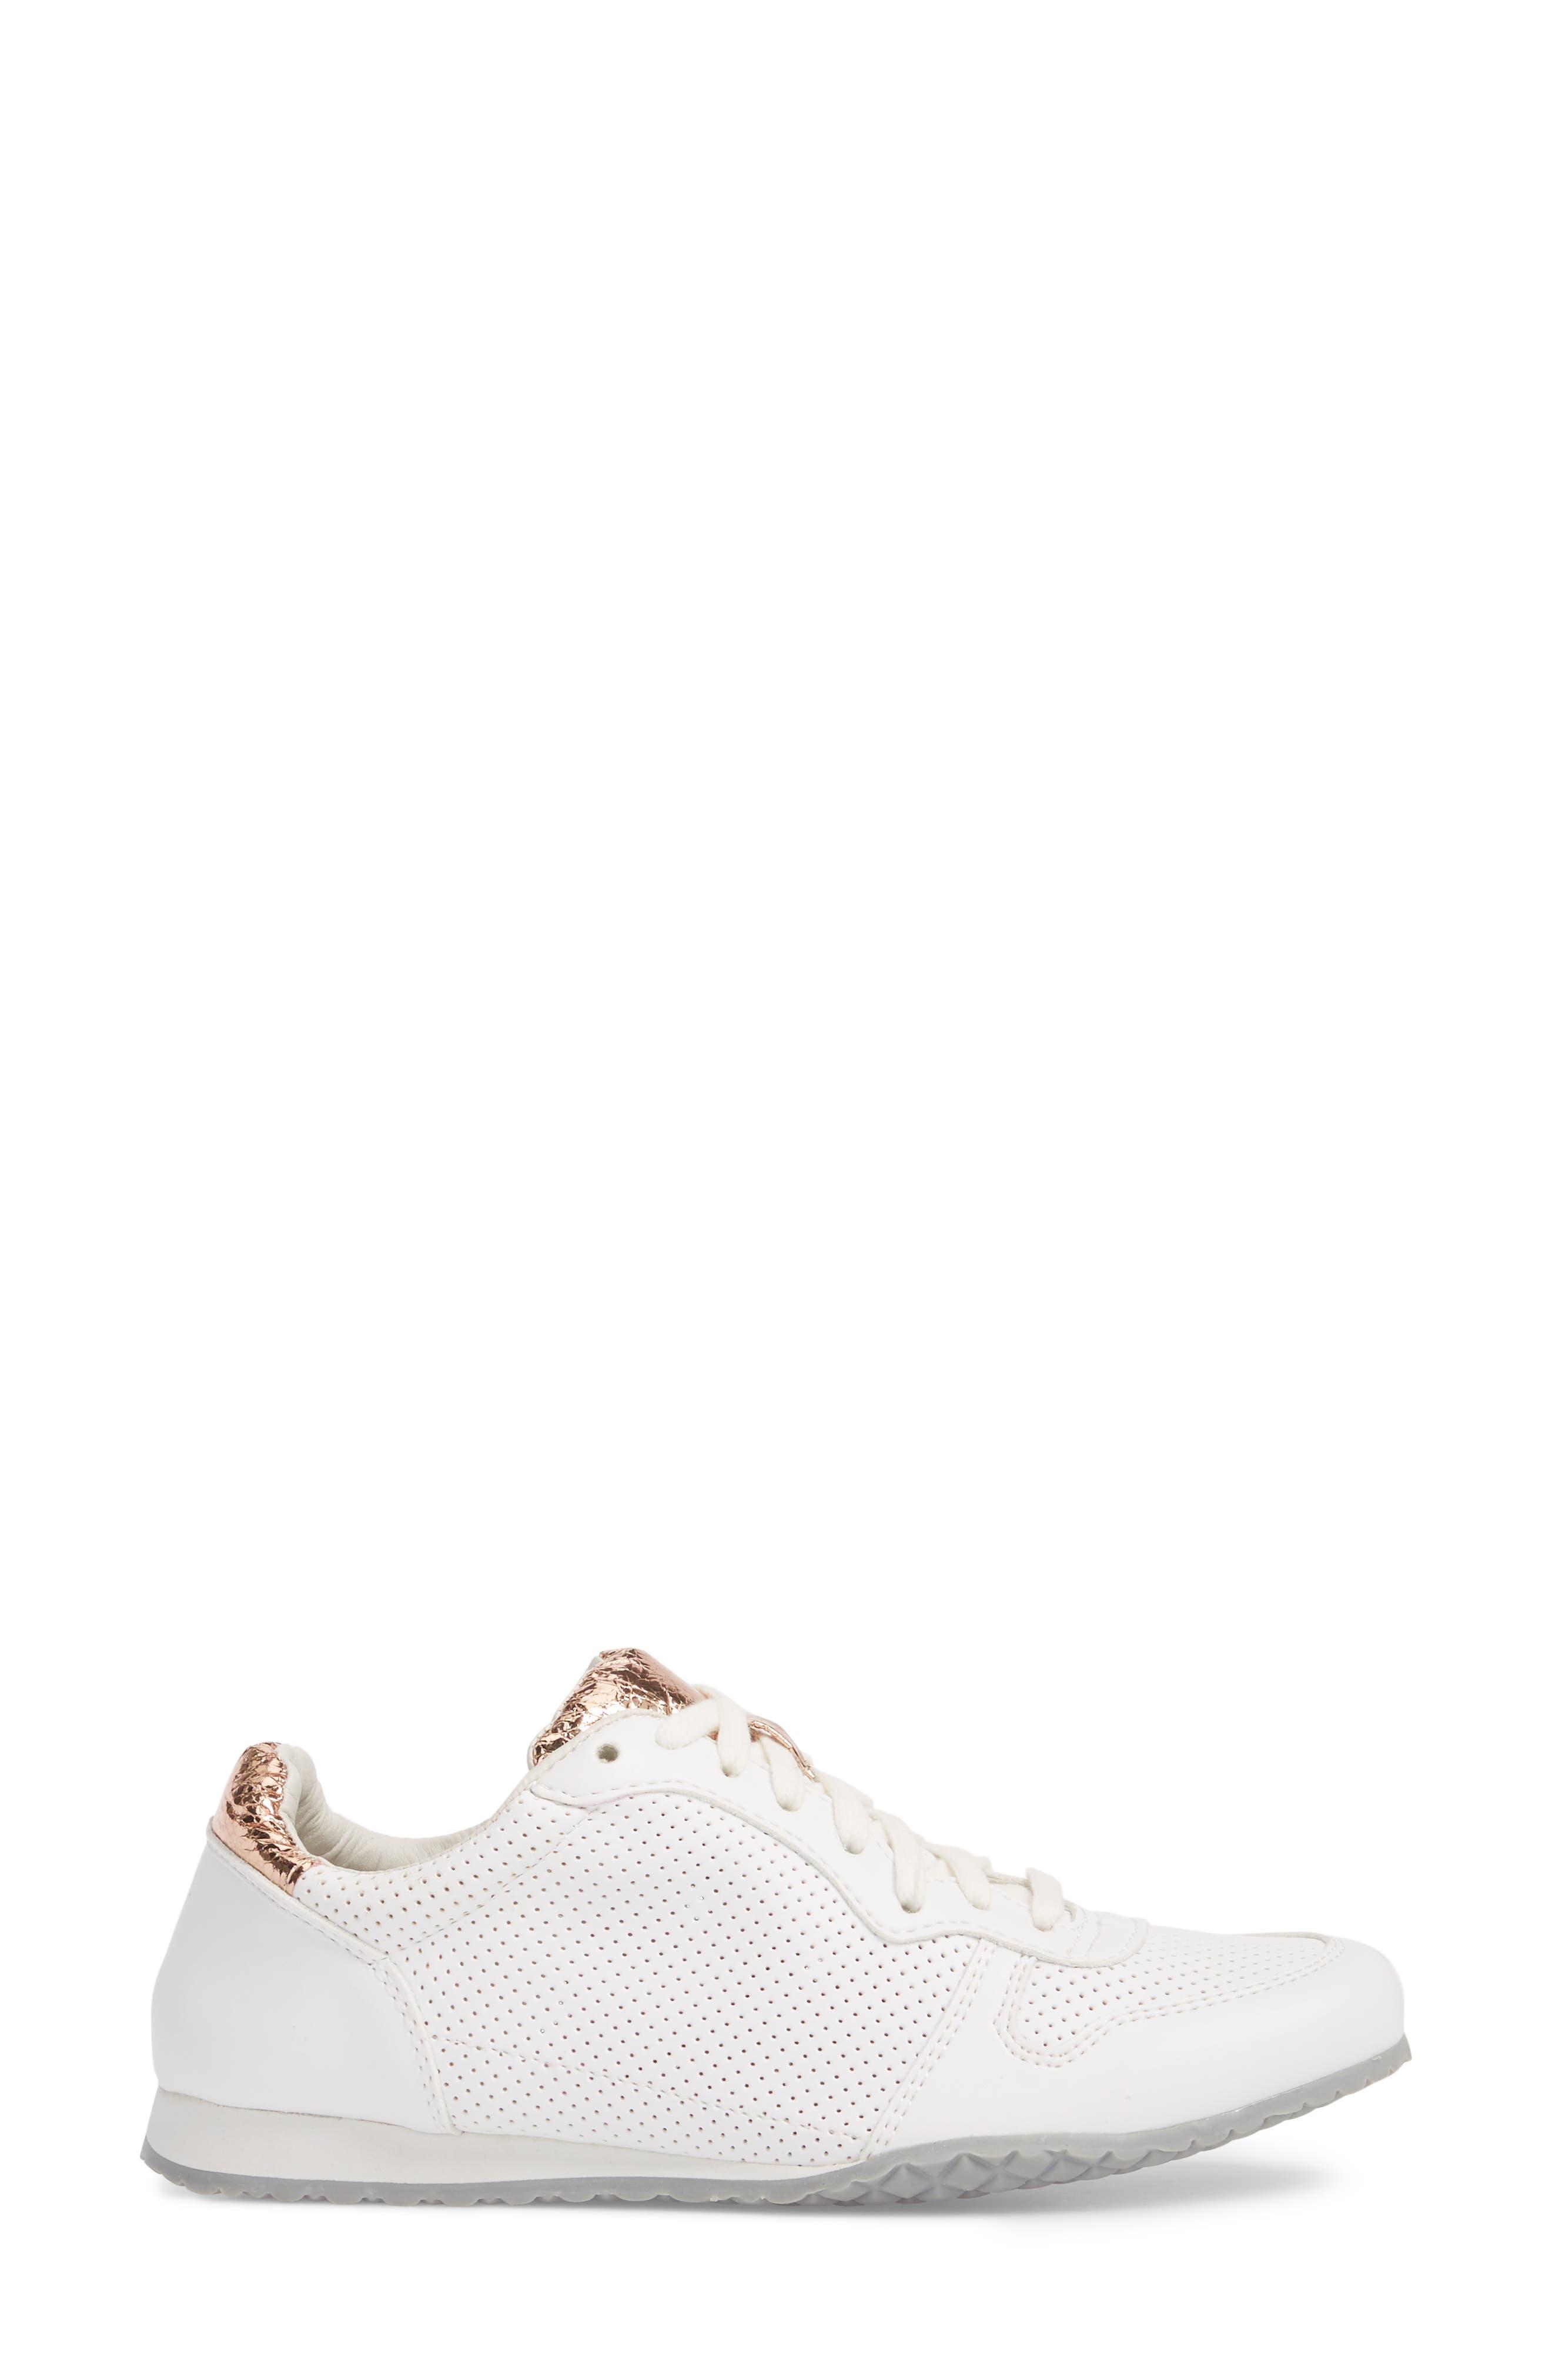 Joanna Perforated Sneaker,                             Alternate thumbnail 3, color,                             124